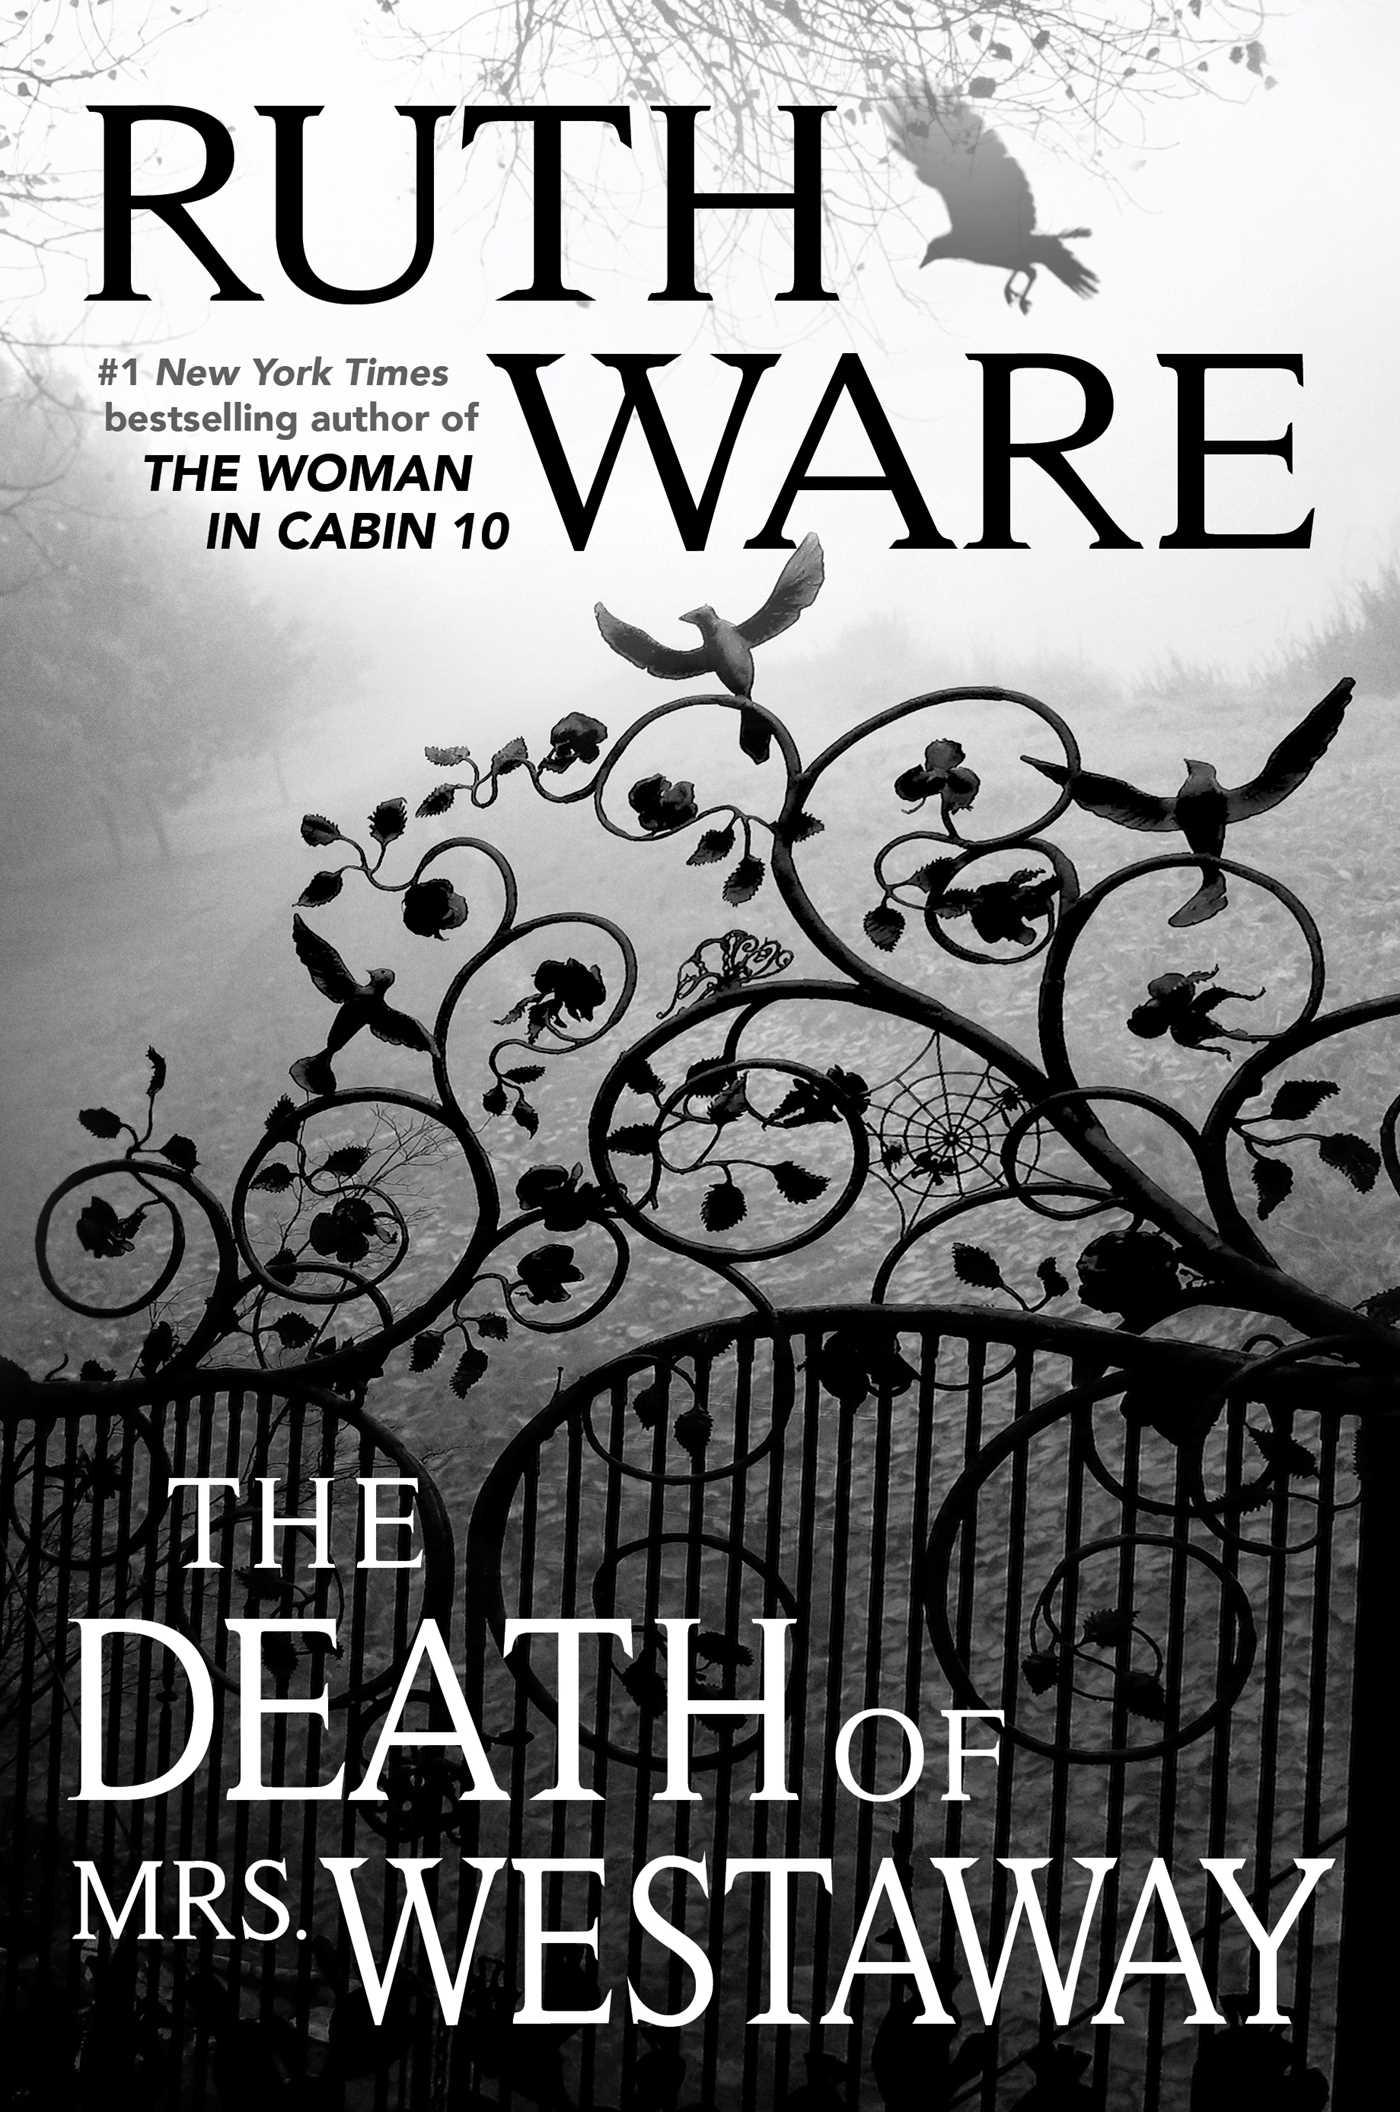 The death of mrs westaway 9781501151859 hr